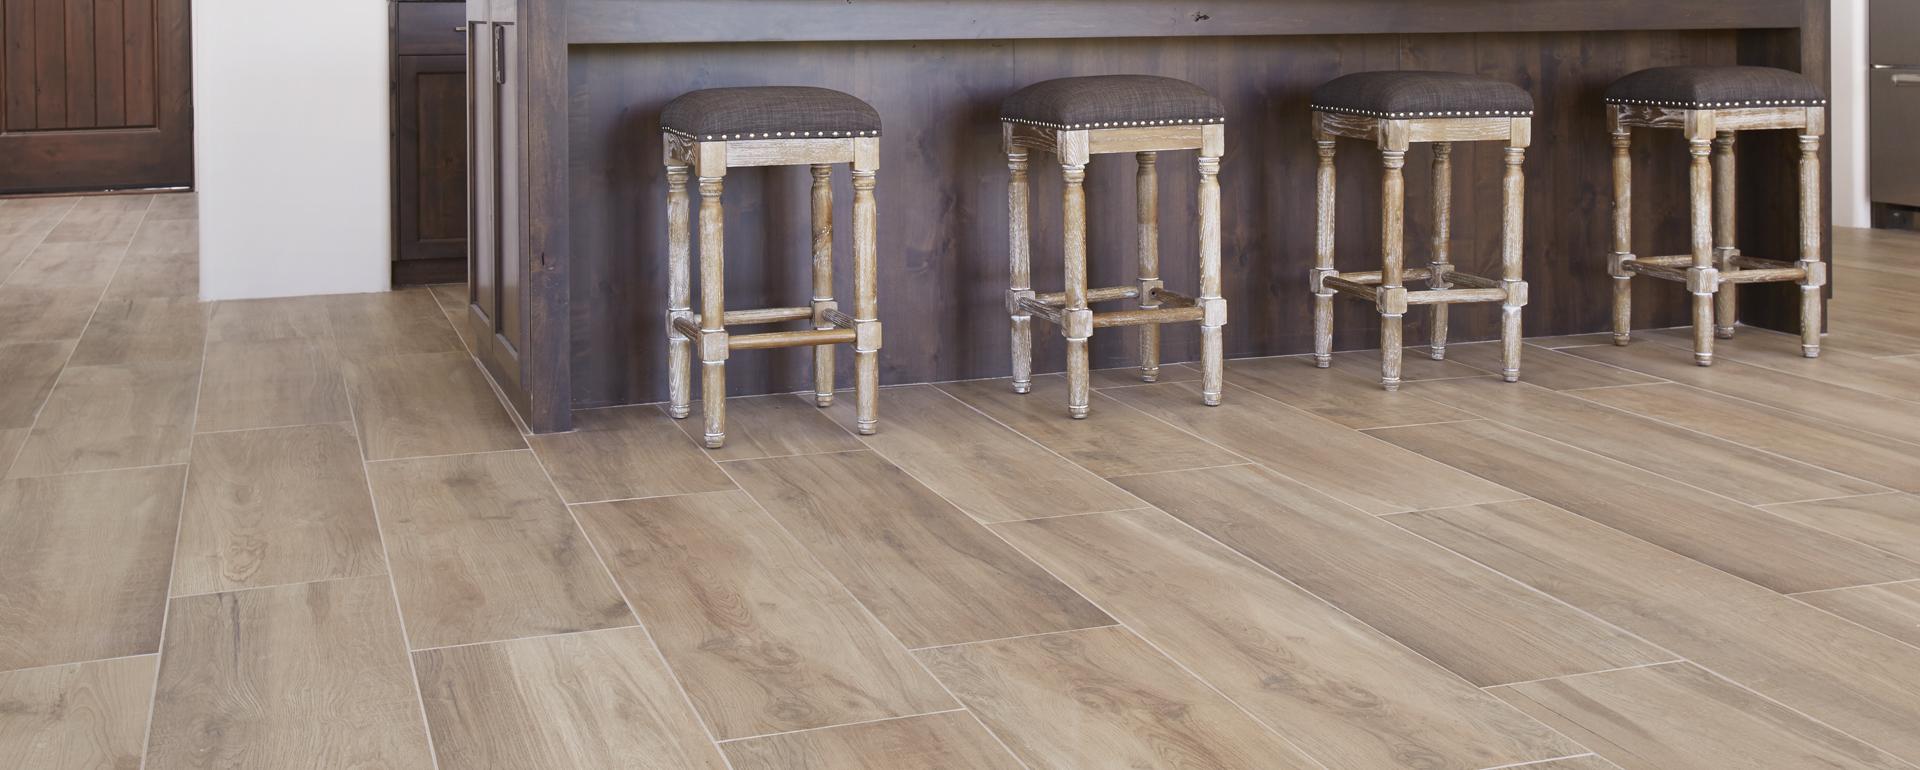 copper state flooring